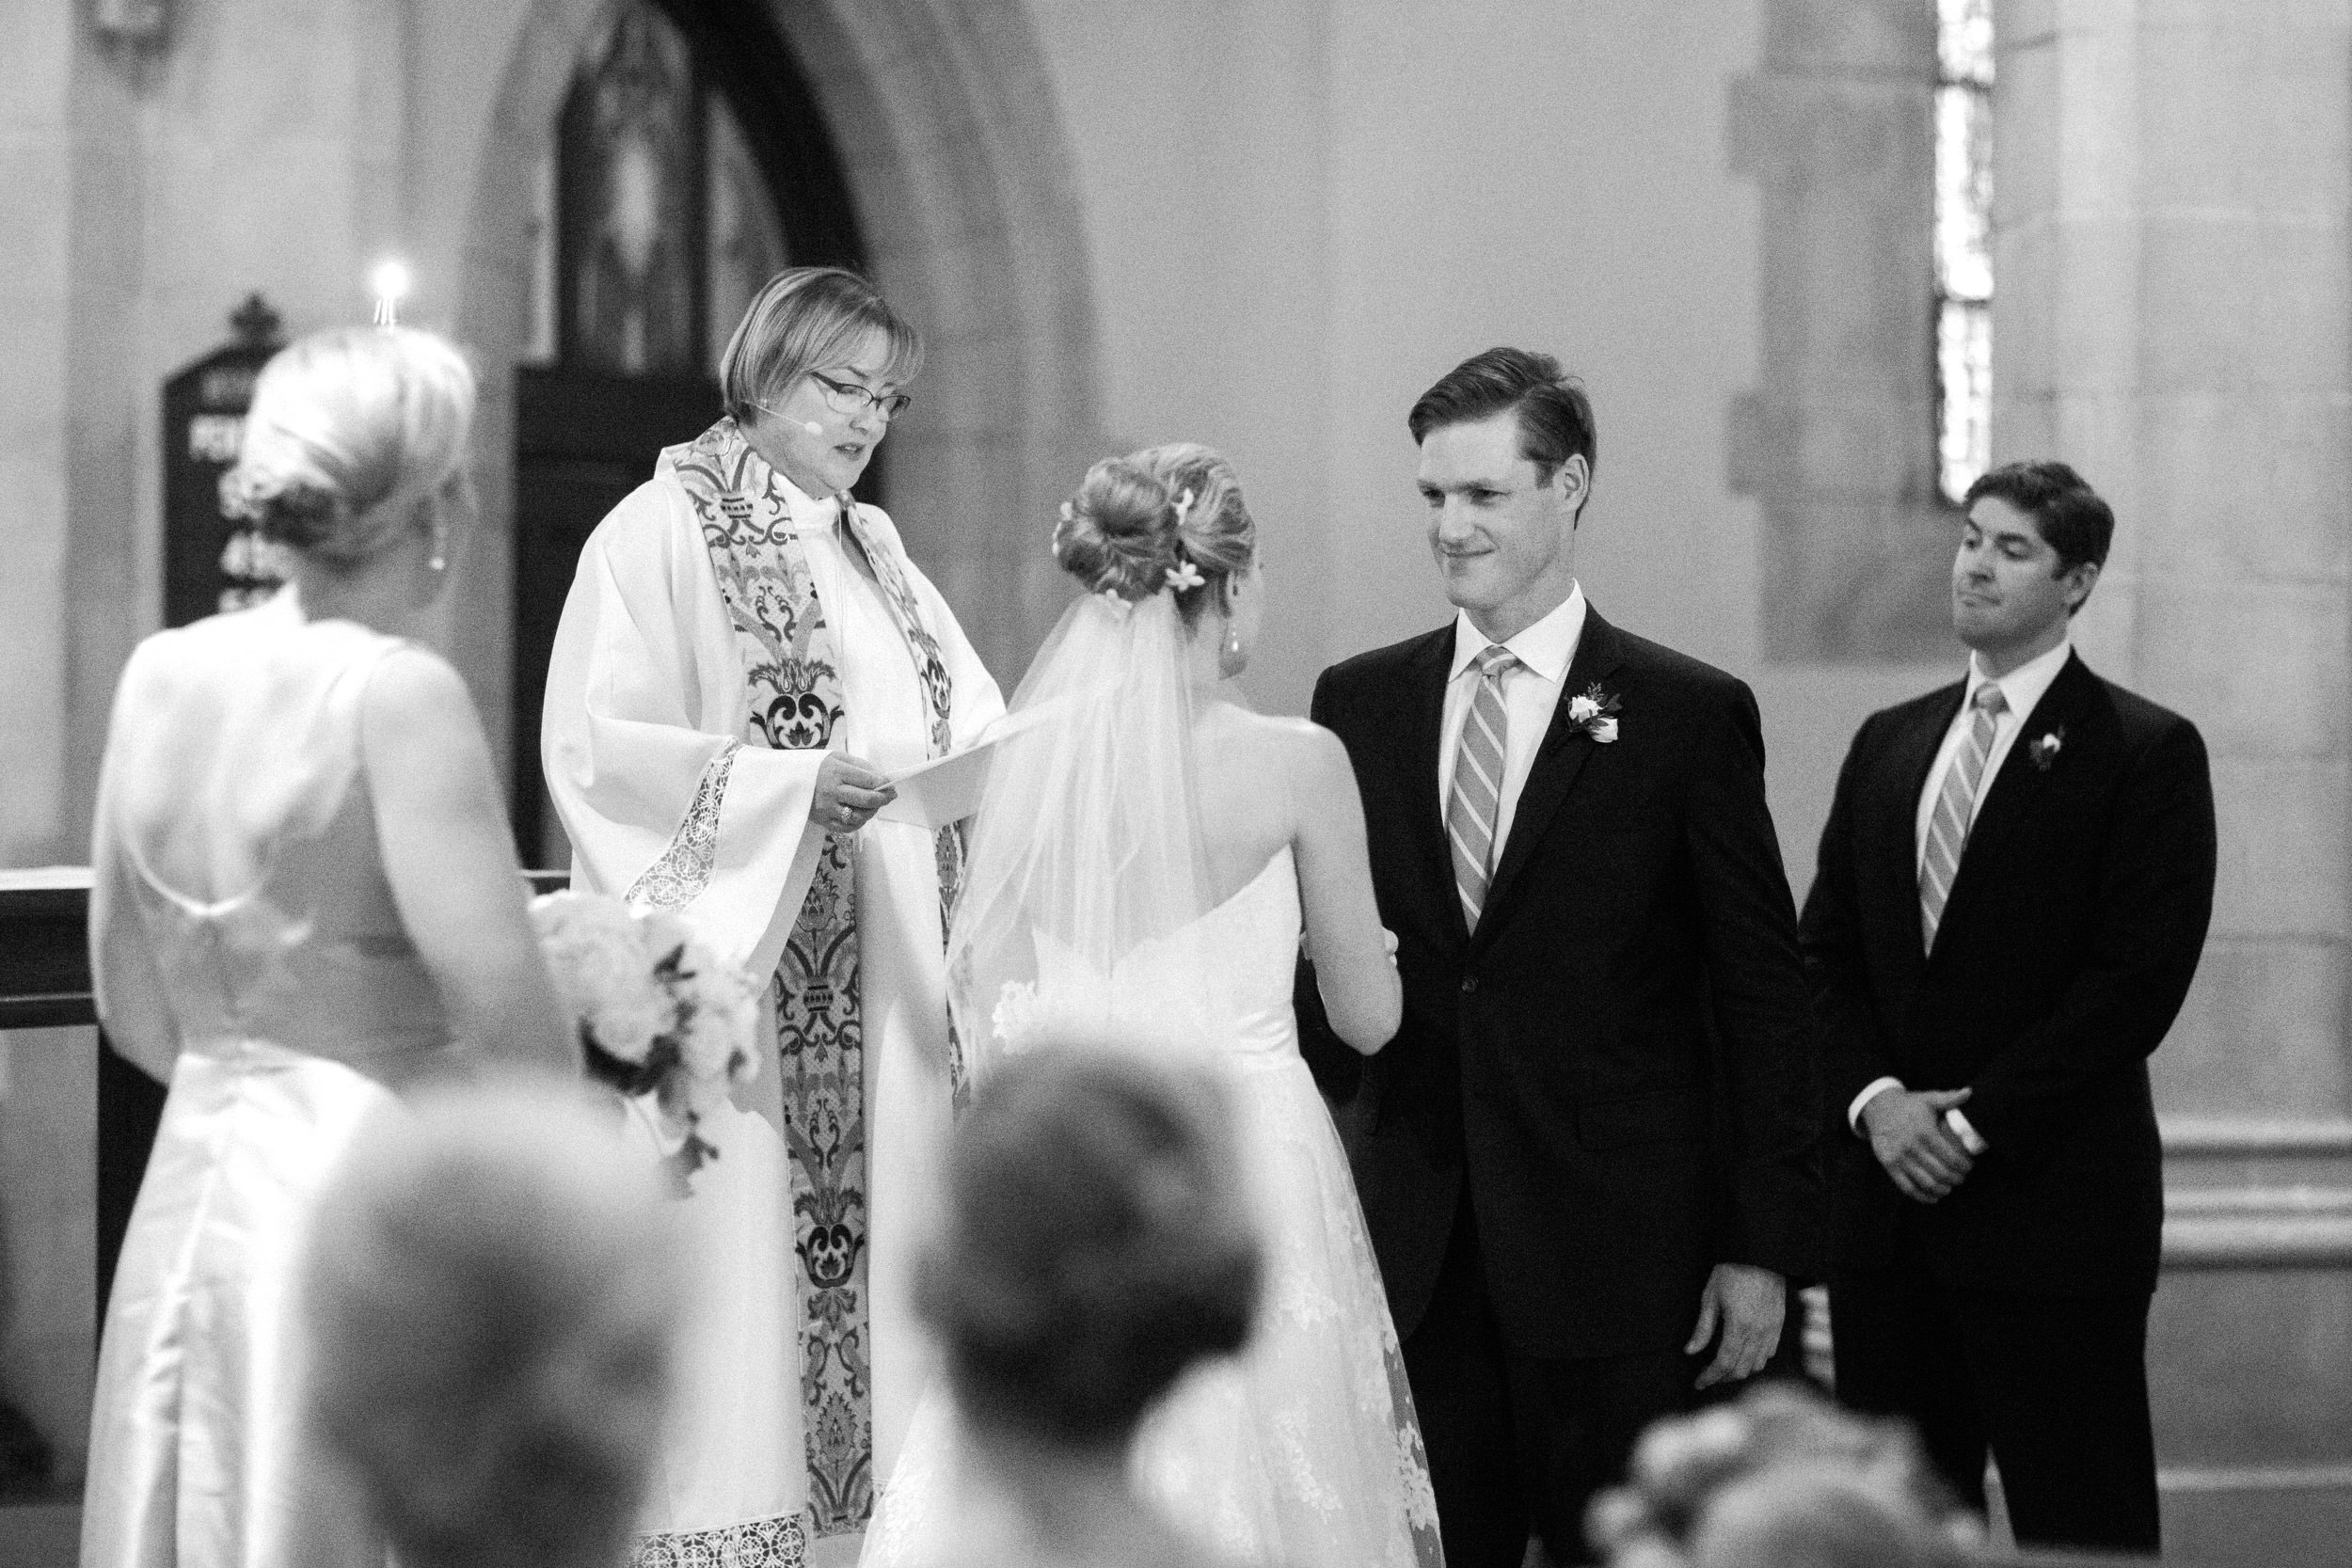 biltmore_santa_barbara_wedding_photos_coral_casino_024.jpg